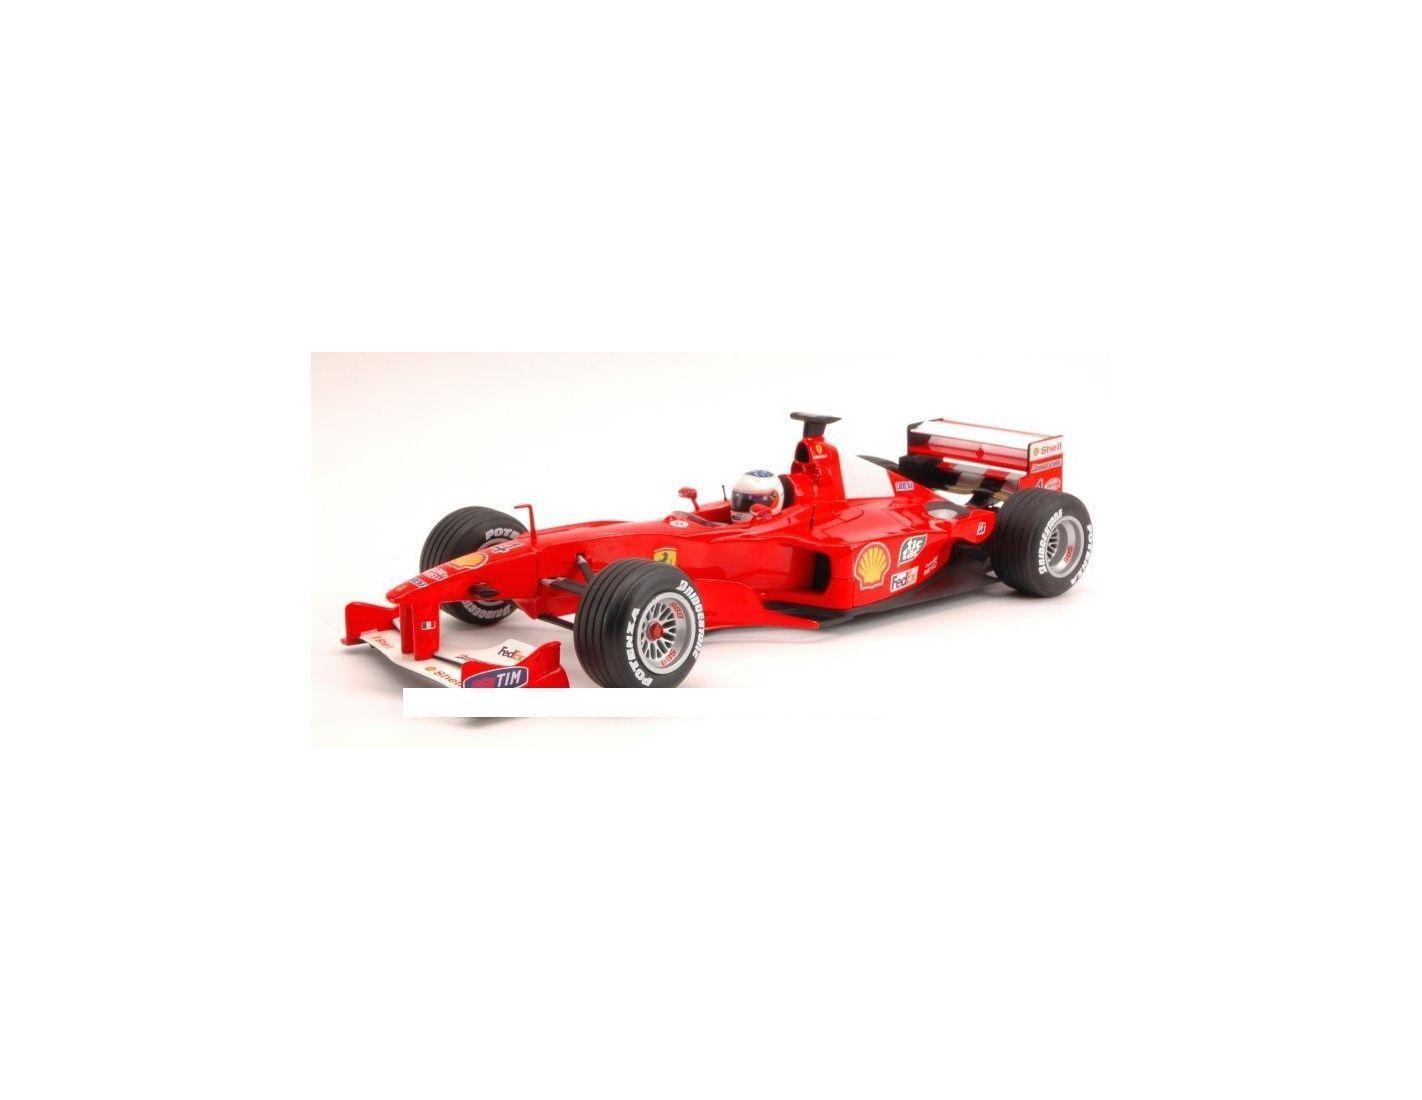 Hot Wheels HW26738 FERRARI F1 2000 N.4 RUBENS BARRICHELLO 2000 1 18 Modellino